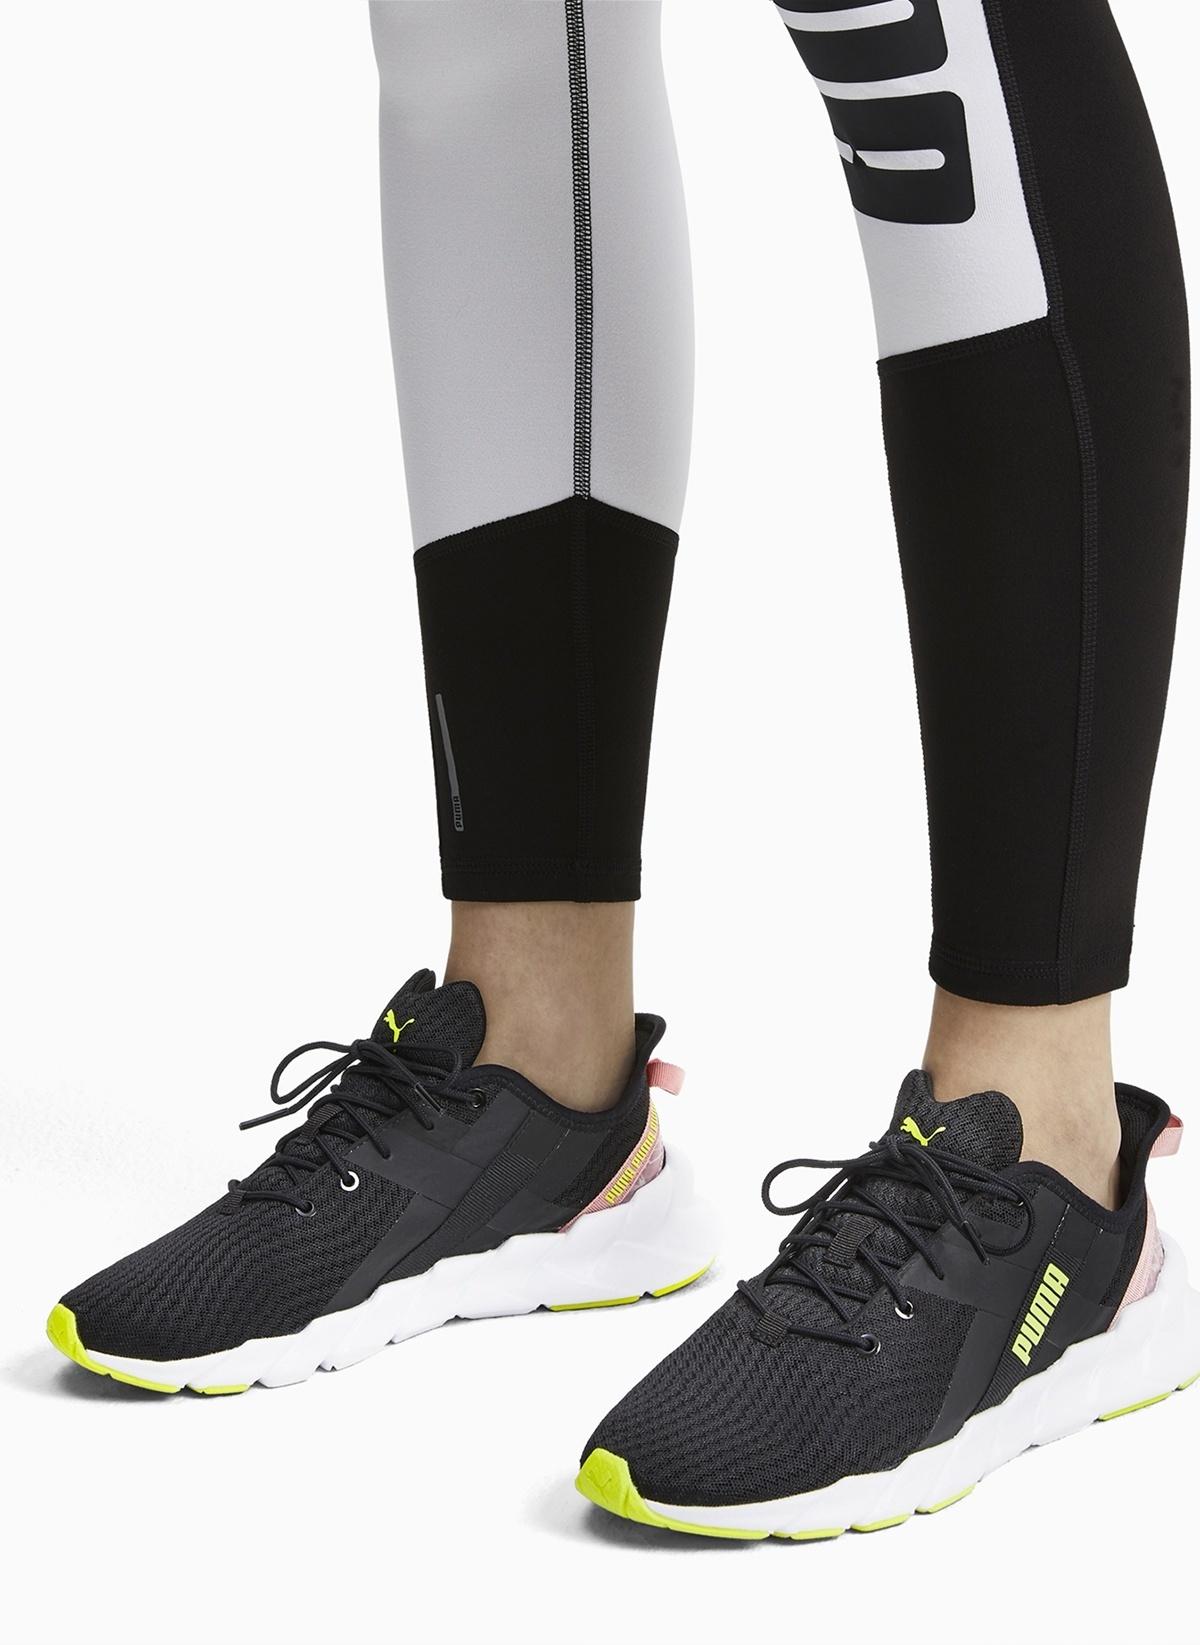 Puma Kadın Koşu Ayakkabısı Siyah | Morhipo | 24802096